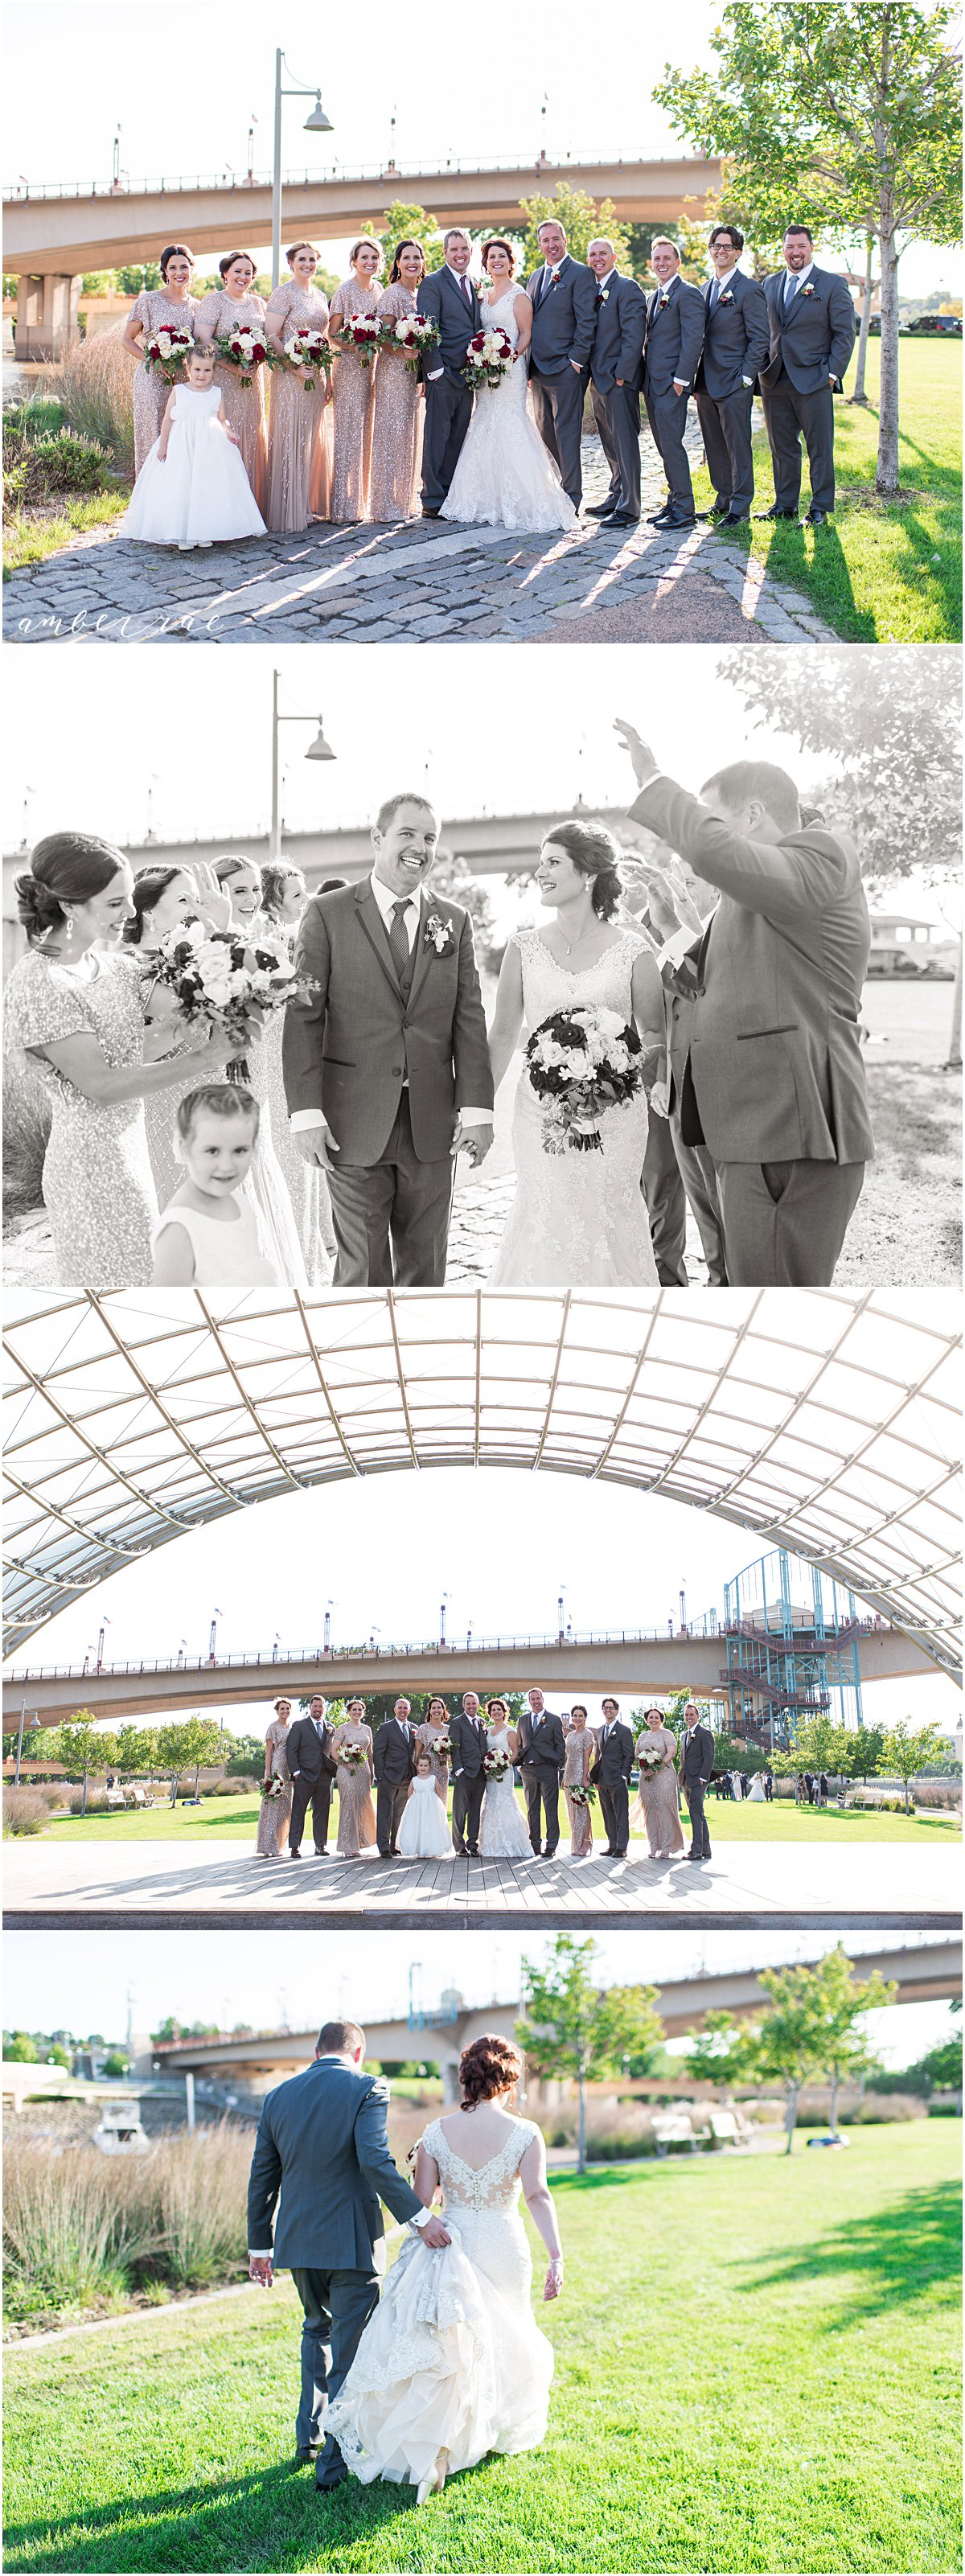 Gustafson Wedding 2018_0021.jpg